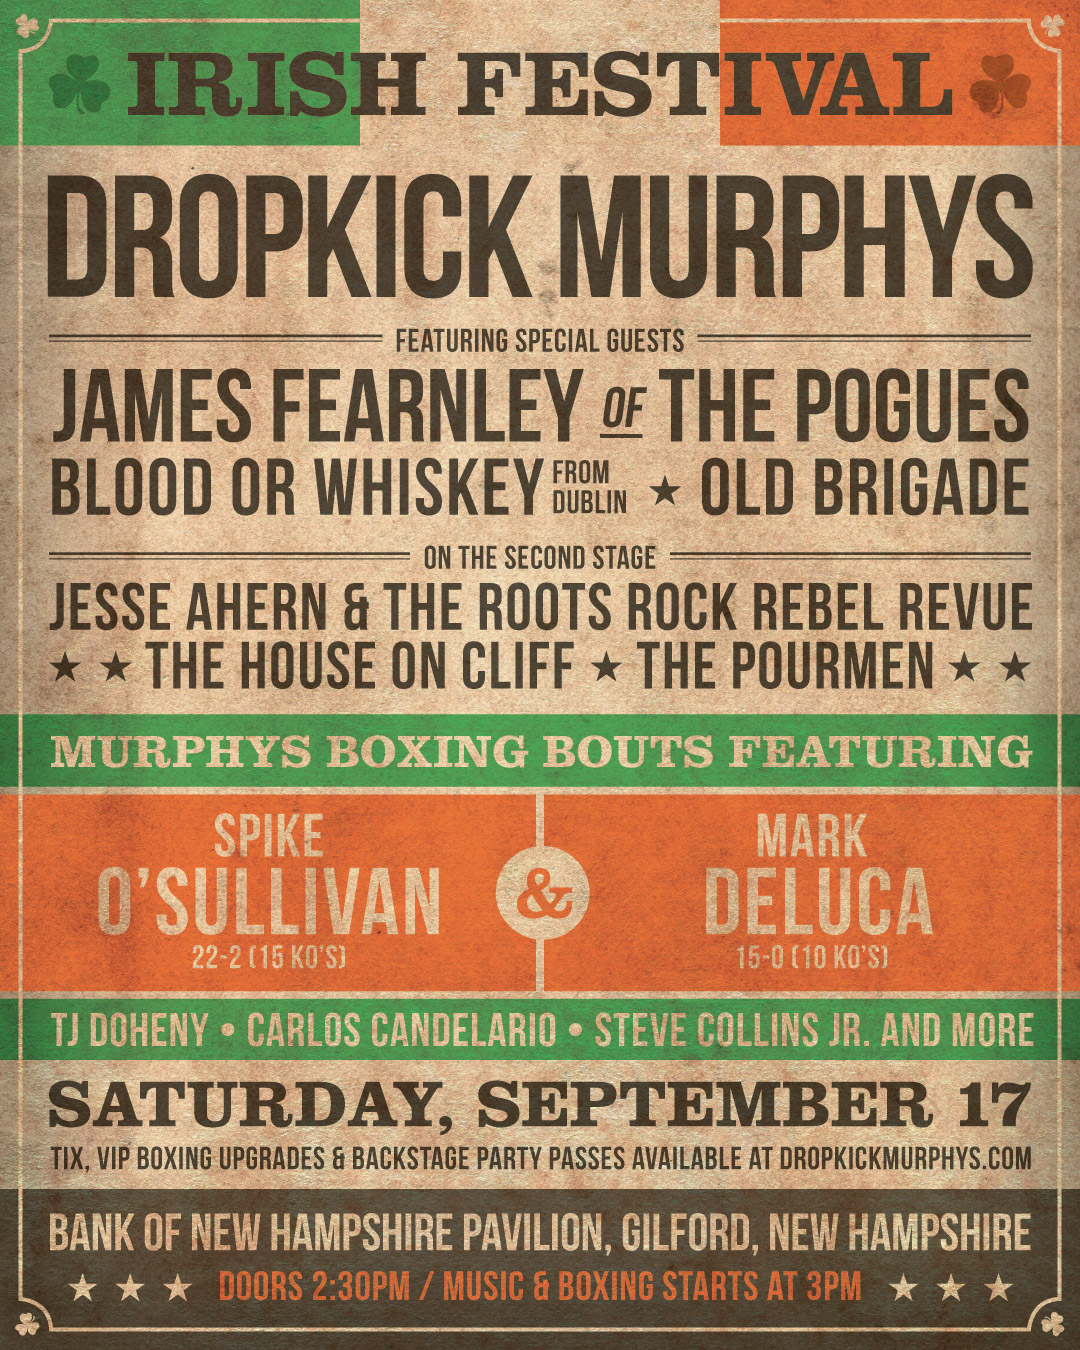 MurphysBoxing-IrishFestival-160808.jpg